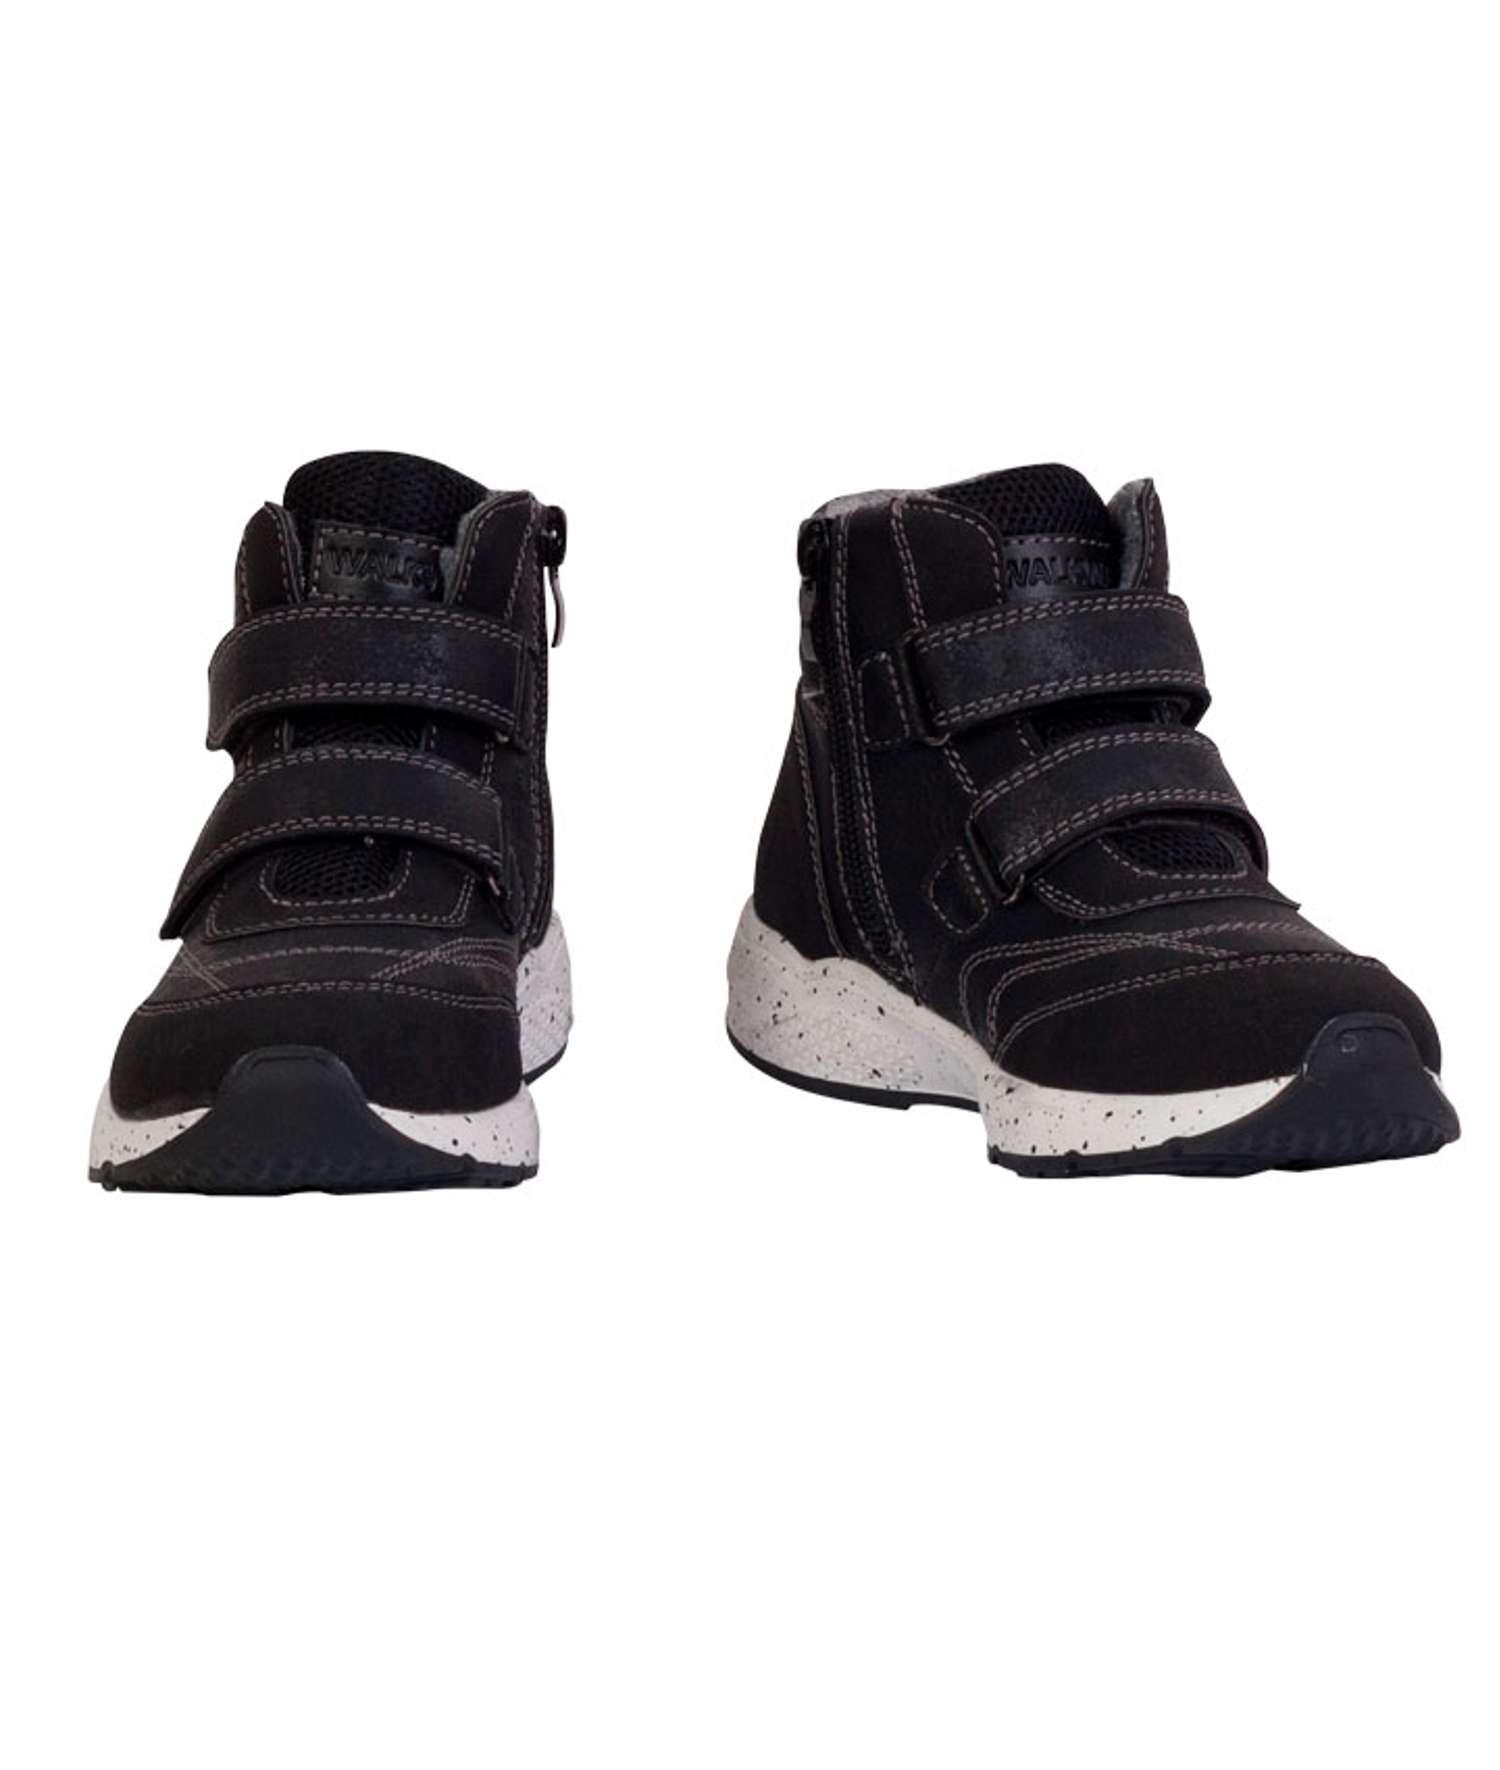 Walkway - Akako børne vinter sneakers - Sort - Størrelse 33